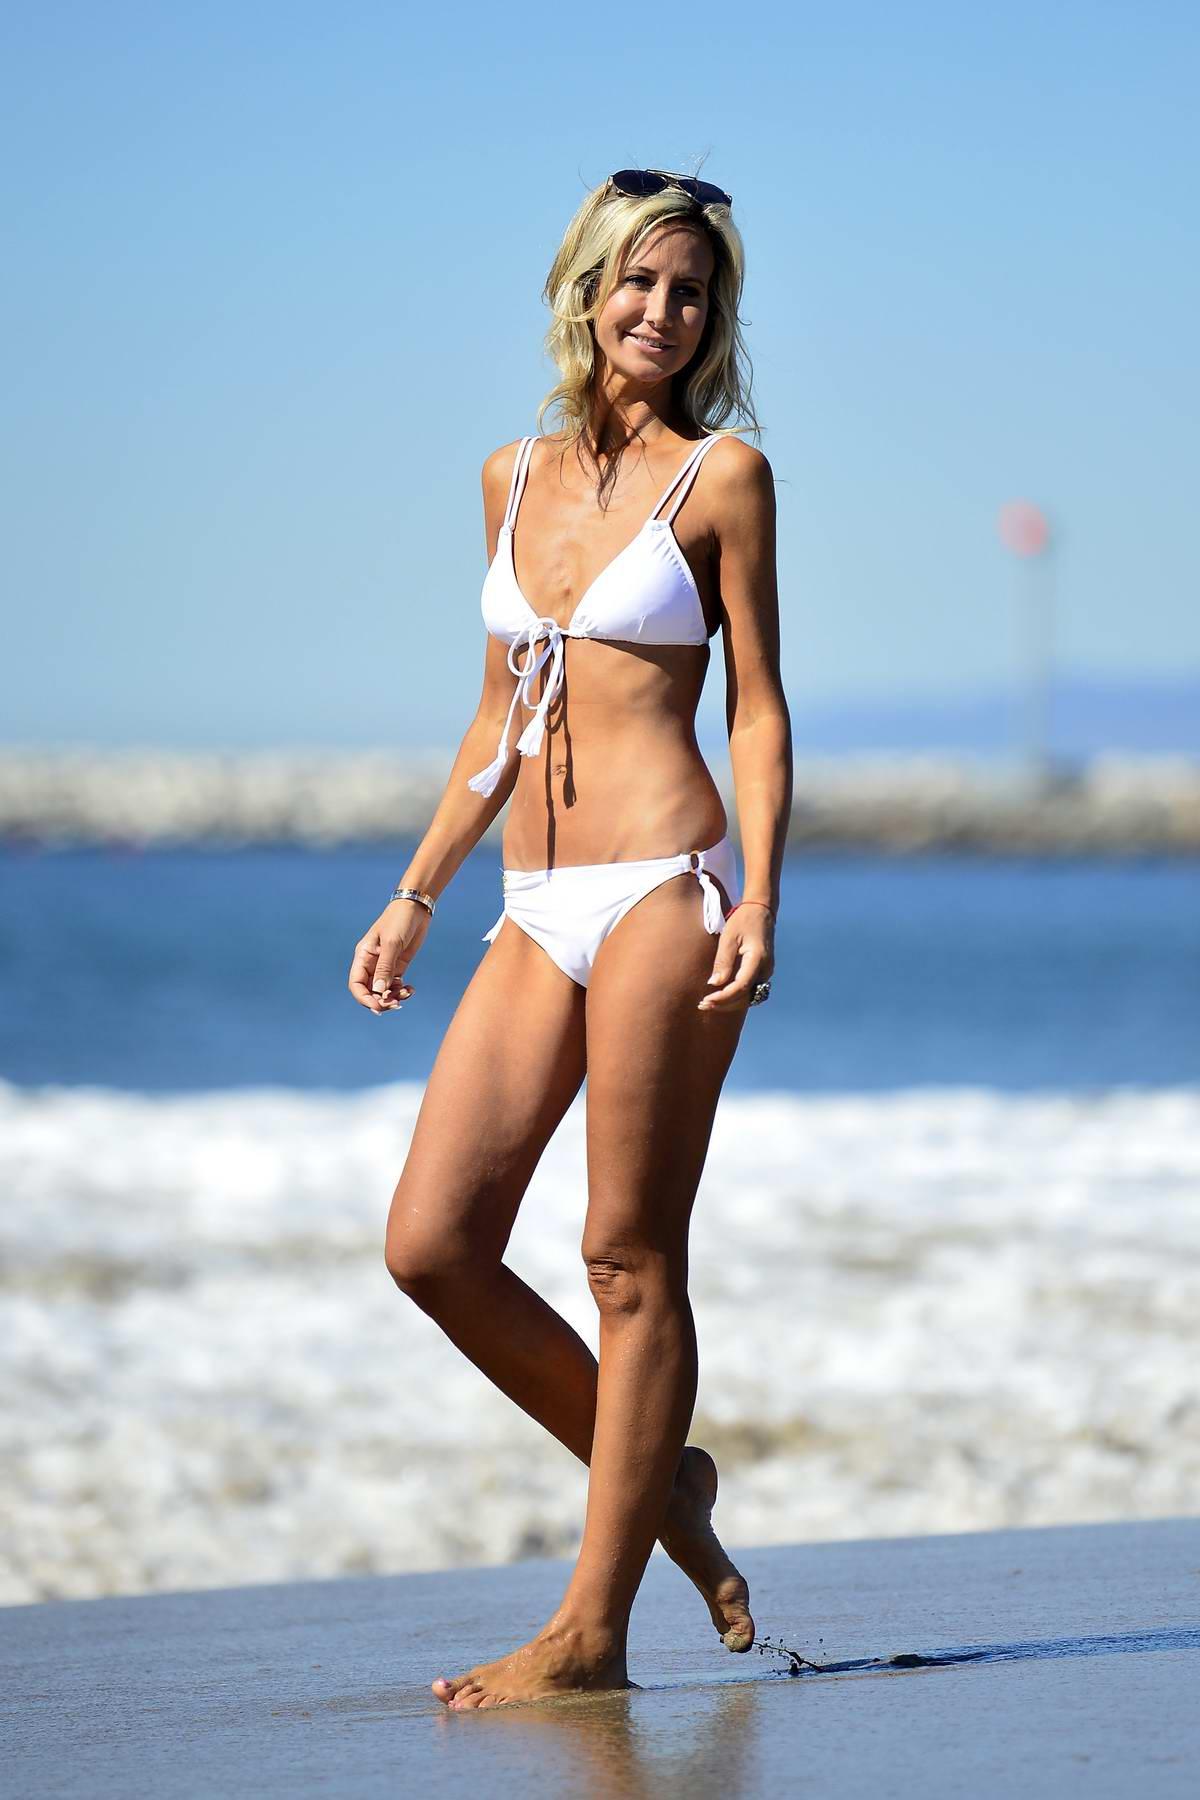 Lady Victoria Harvey wears a white bikini from her own range while on the beach in Malibu, California